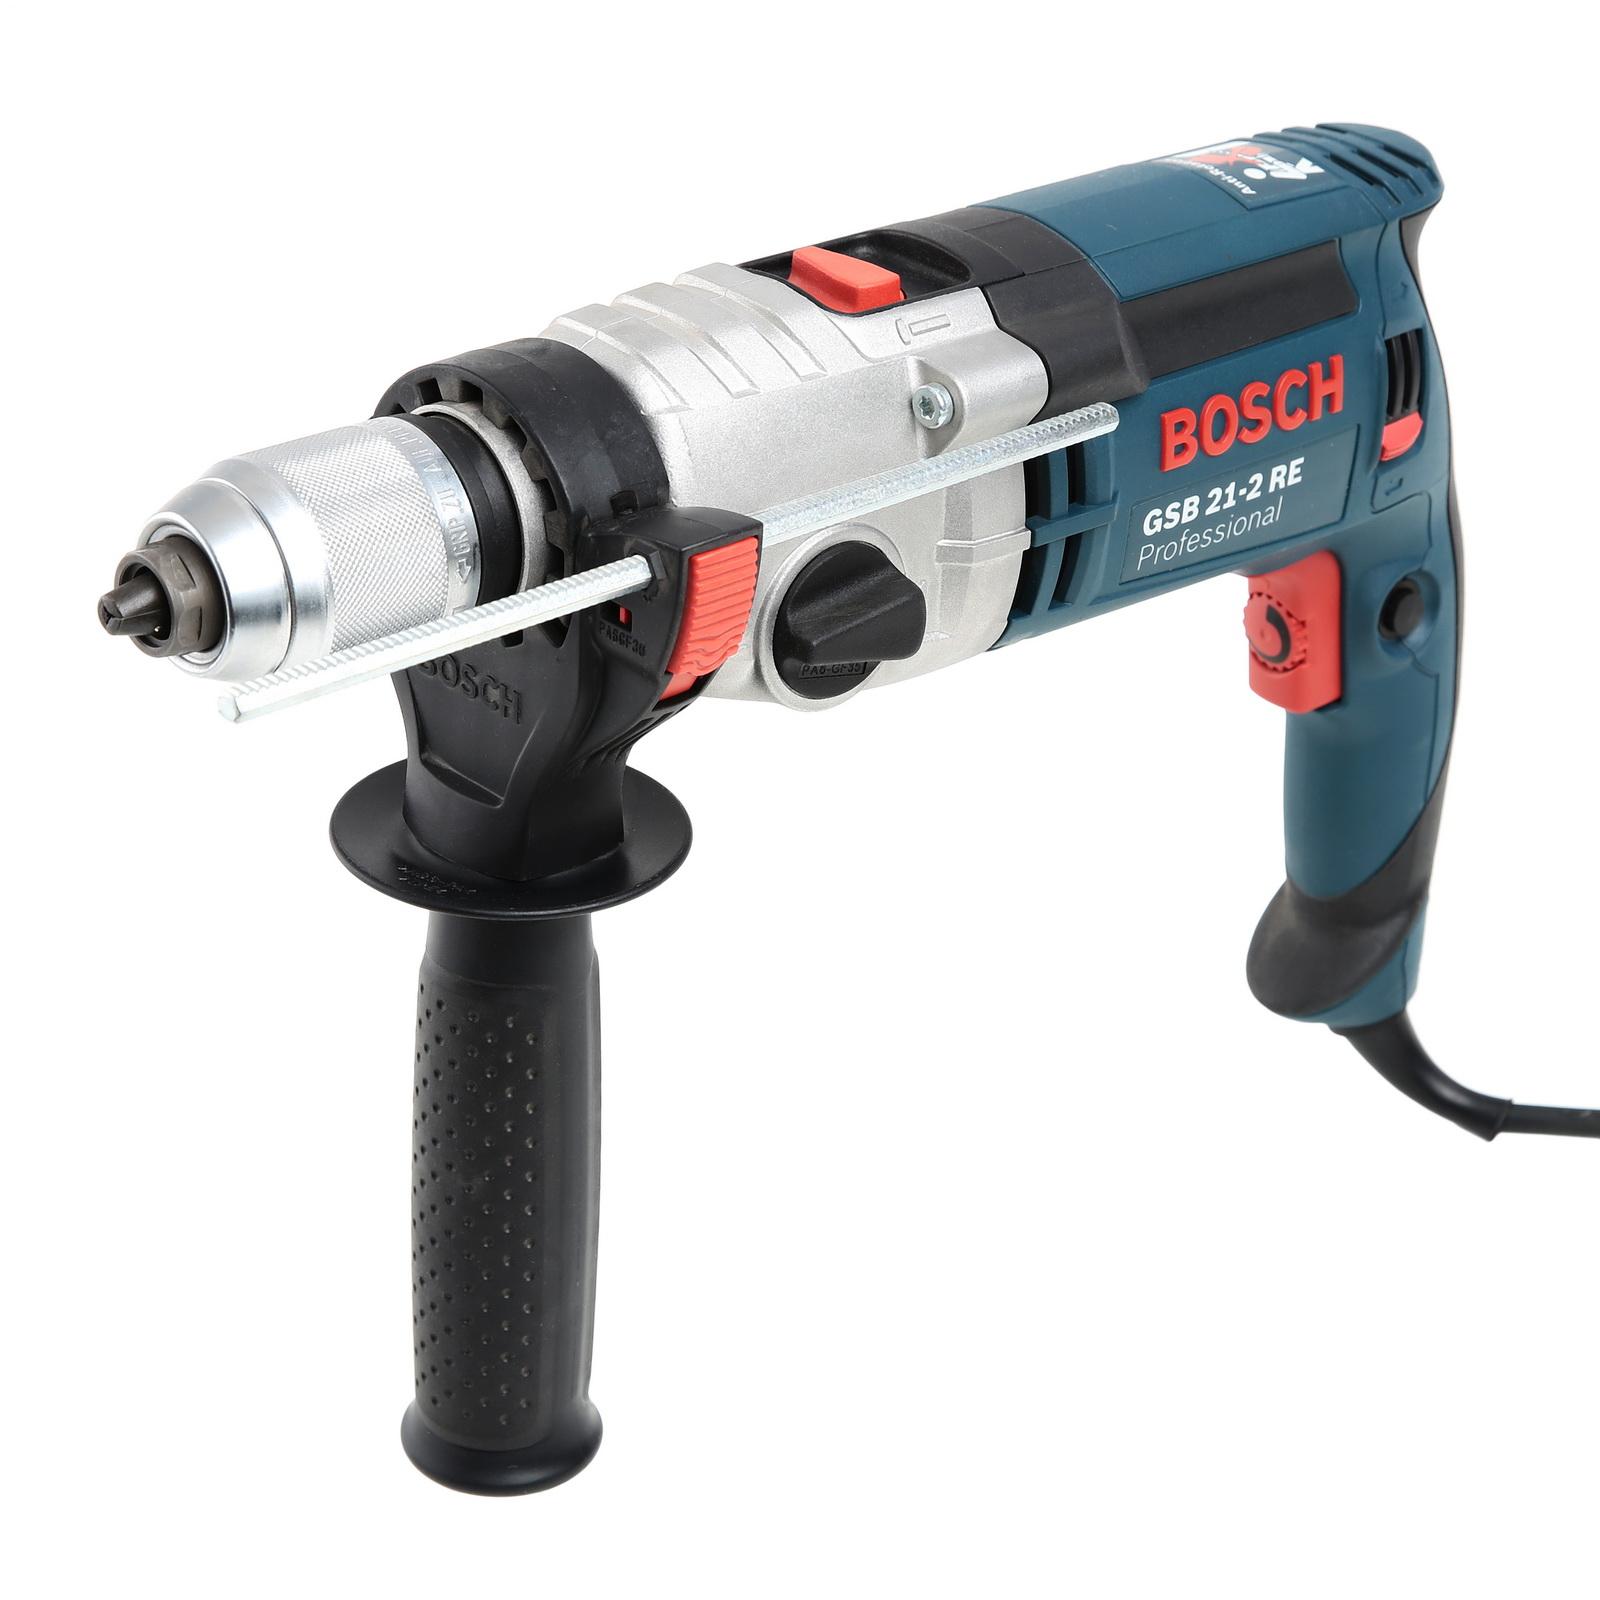 Дрель ударная Bosch Gsb 21-2 re (0.601.19c.500) bosch gsb 21 2 re звп professional